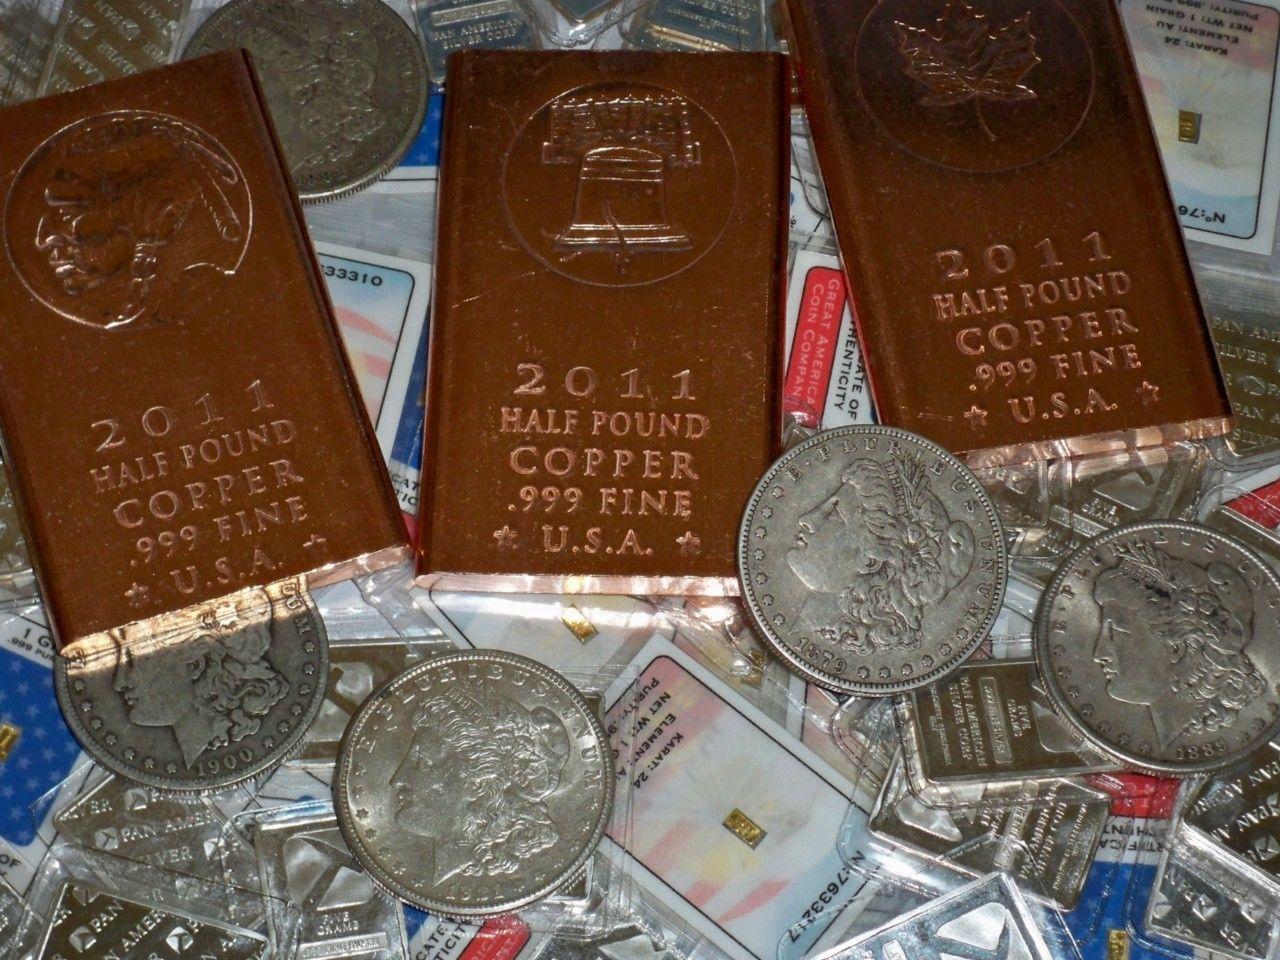 Authentic Gold Bar Silver Bar Copper Bar 100 Year Old Silver Dollar Lot Shopnetone Copper Bar Silver Bars Gold Bar